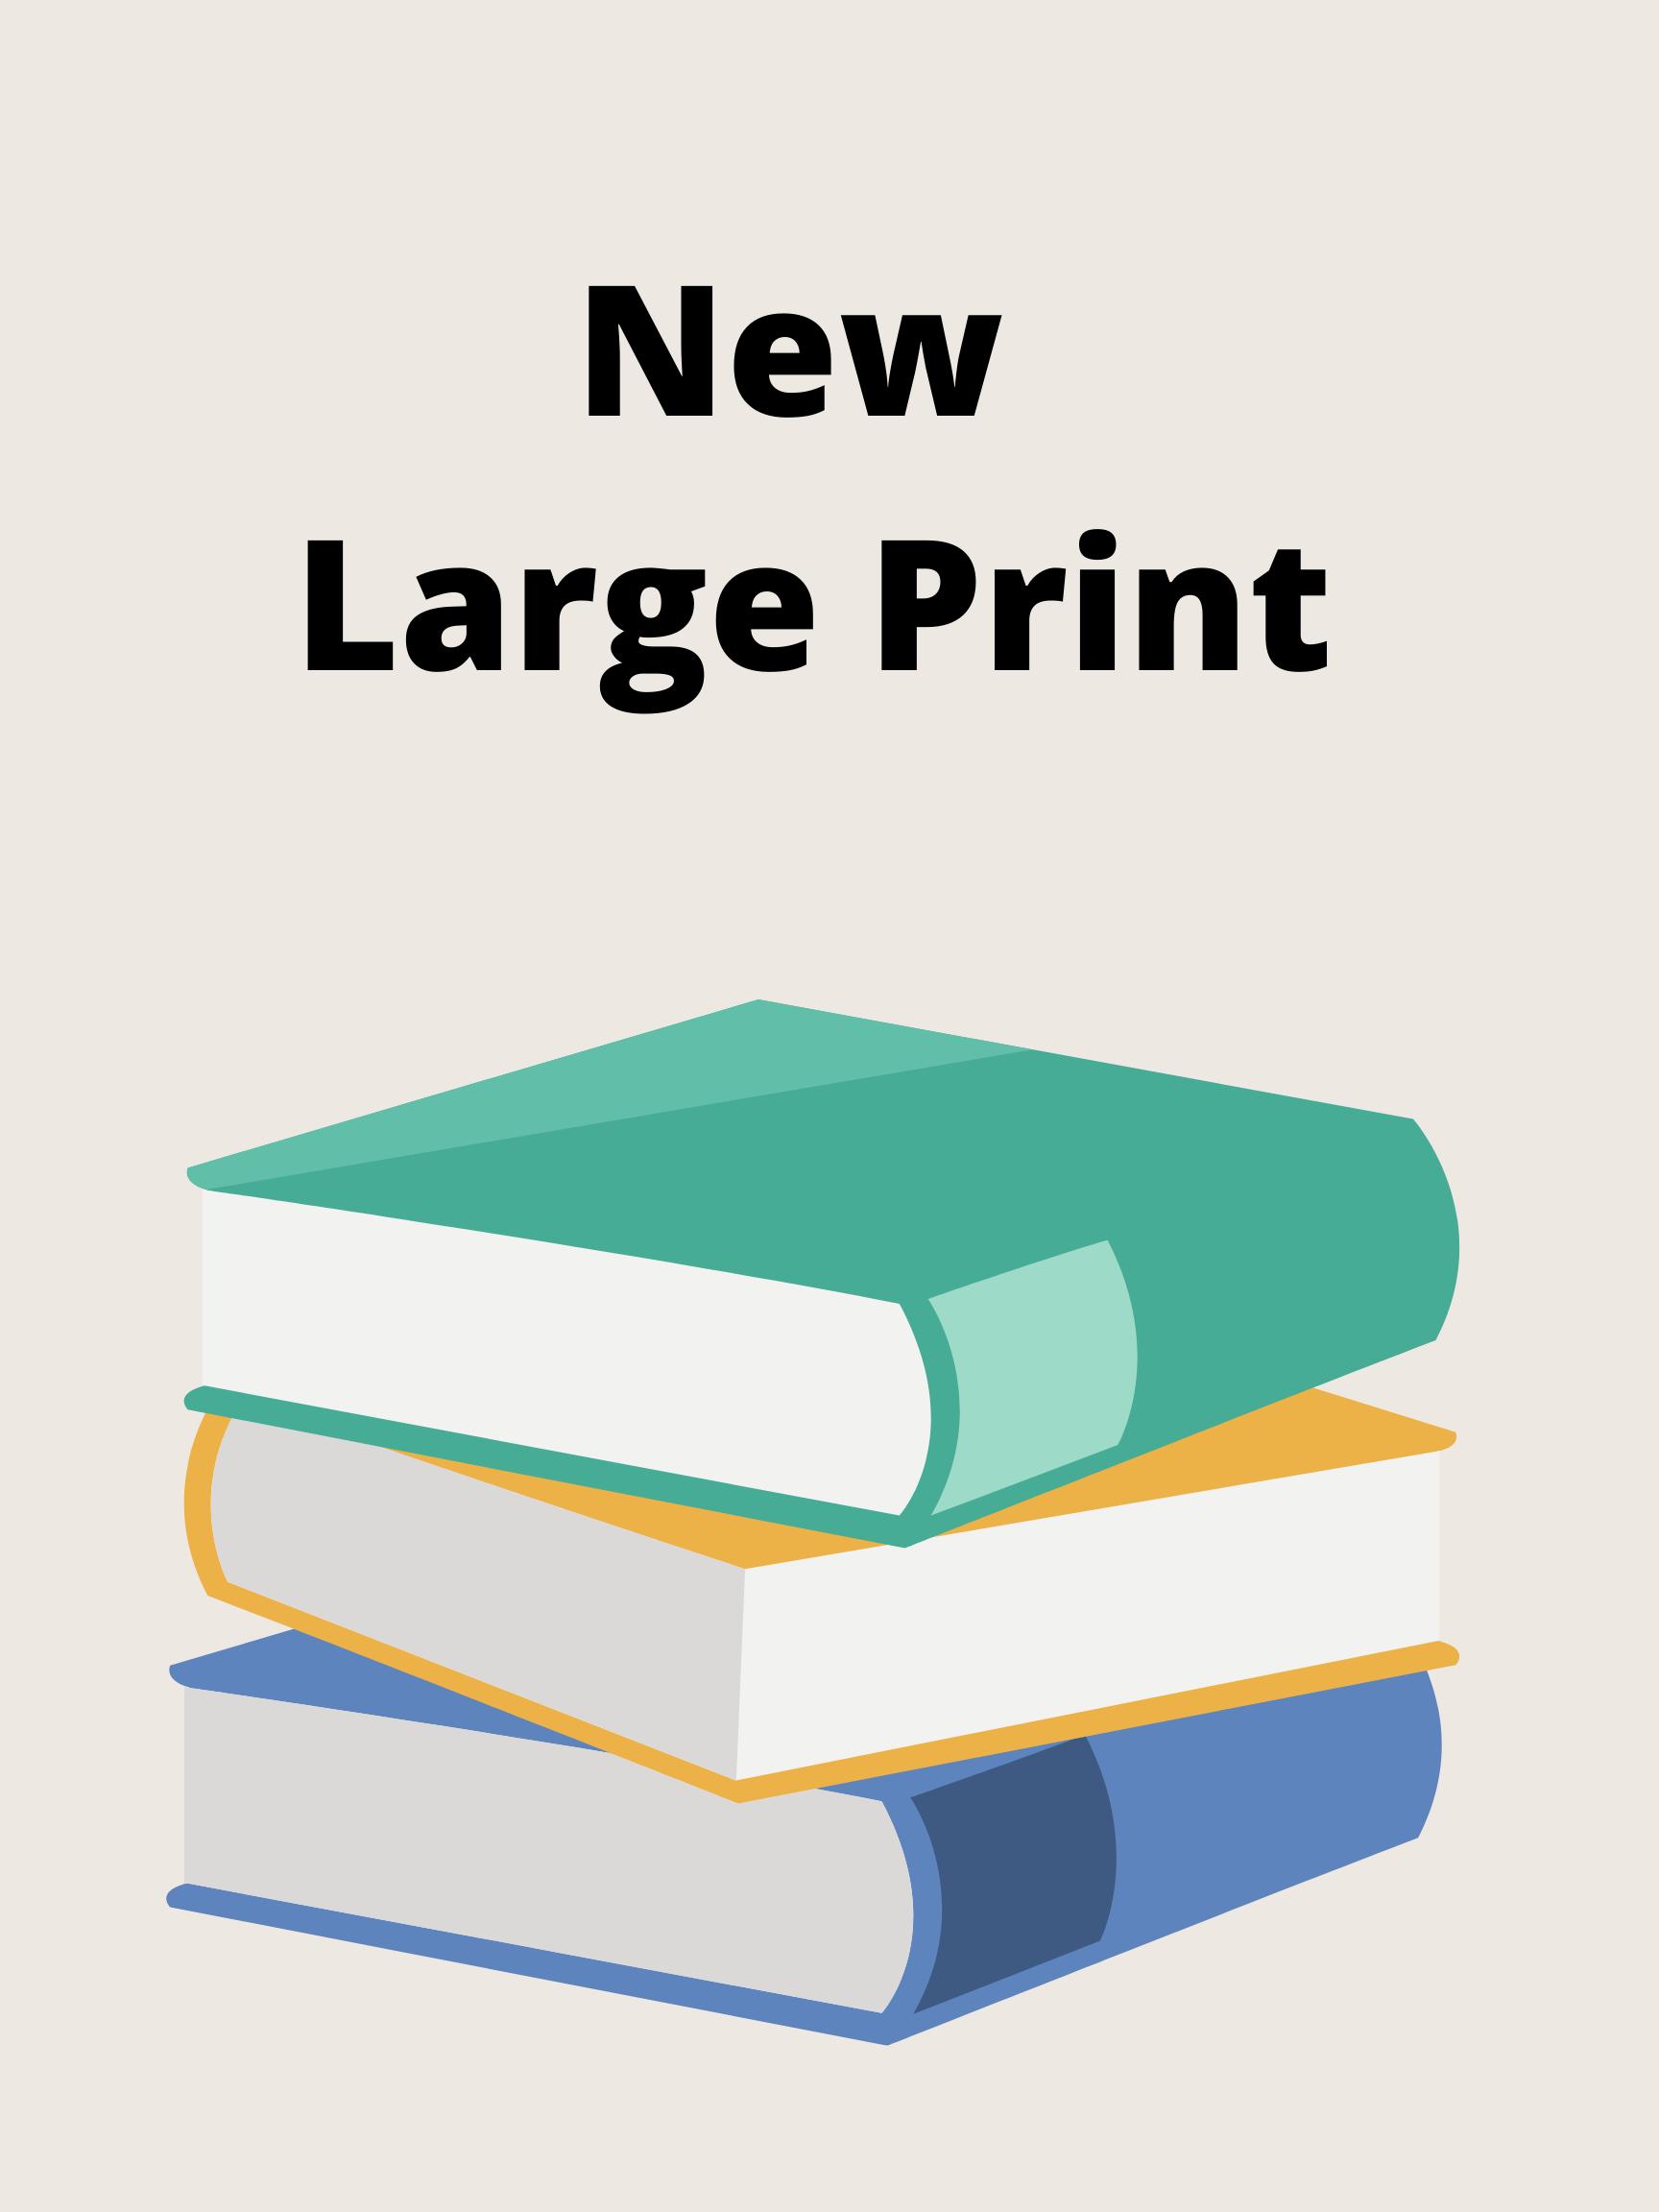 New Large Print